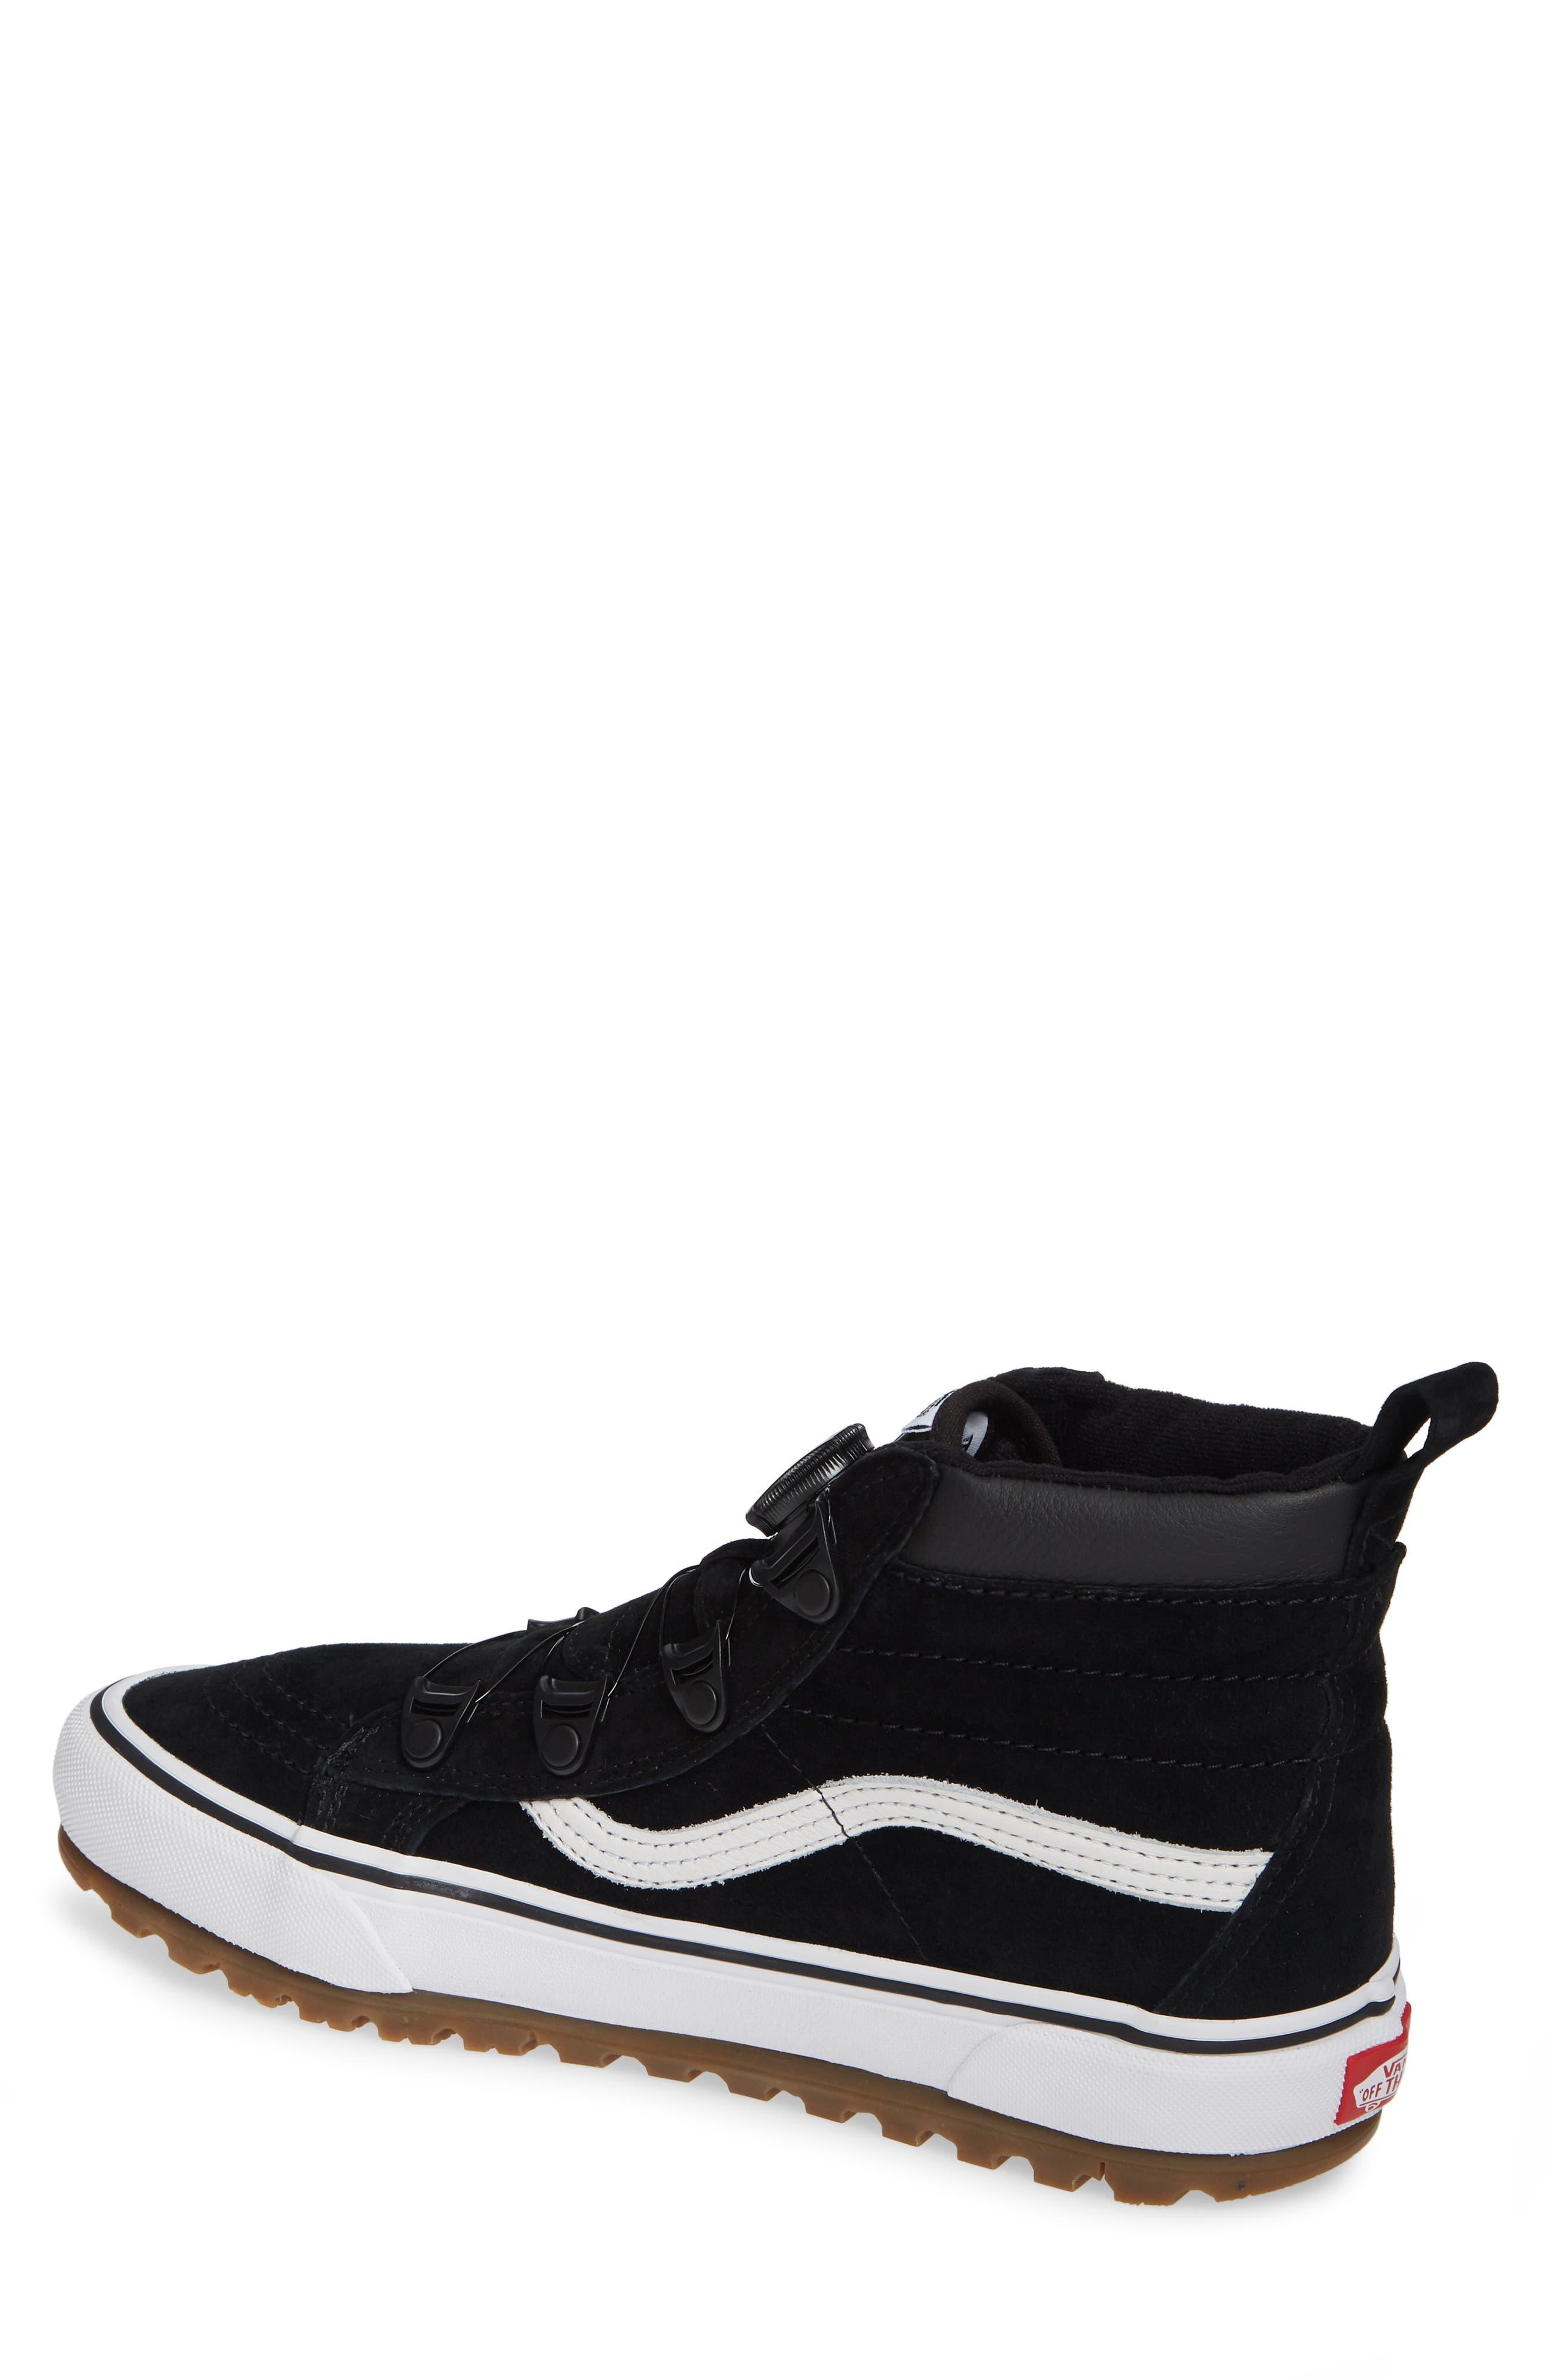 Sk8-Hi MTE Boa Sneaker,                             Alternate thumbnail 2, color,                             001